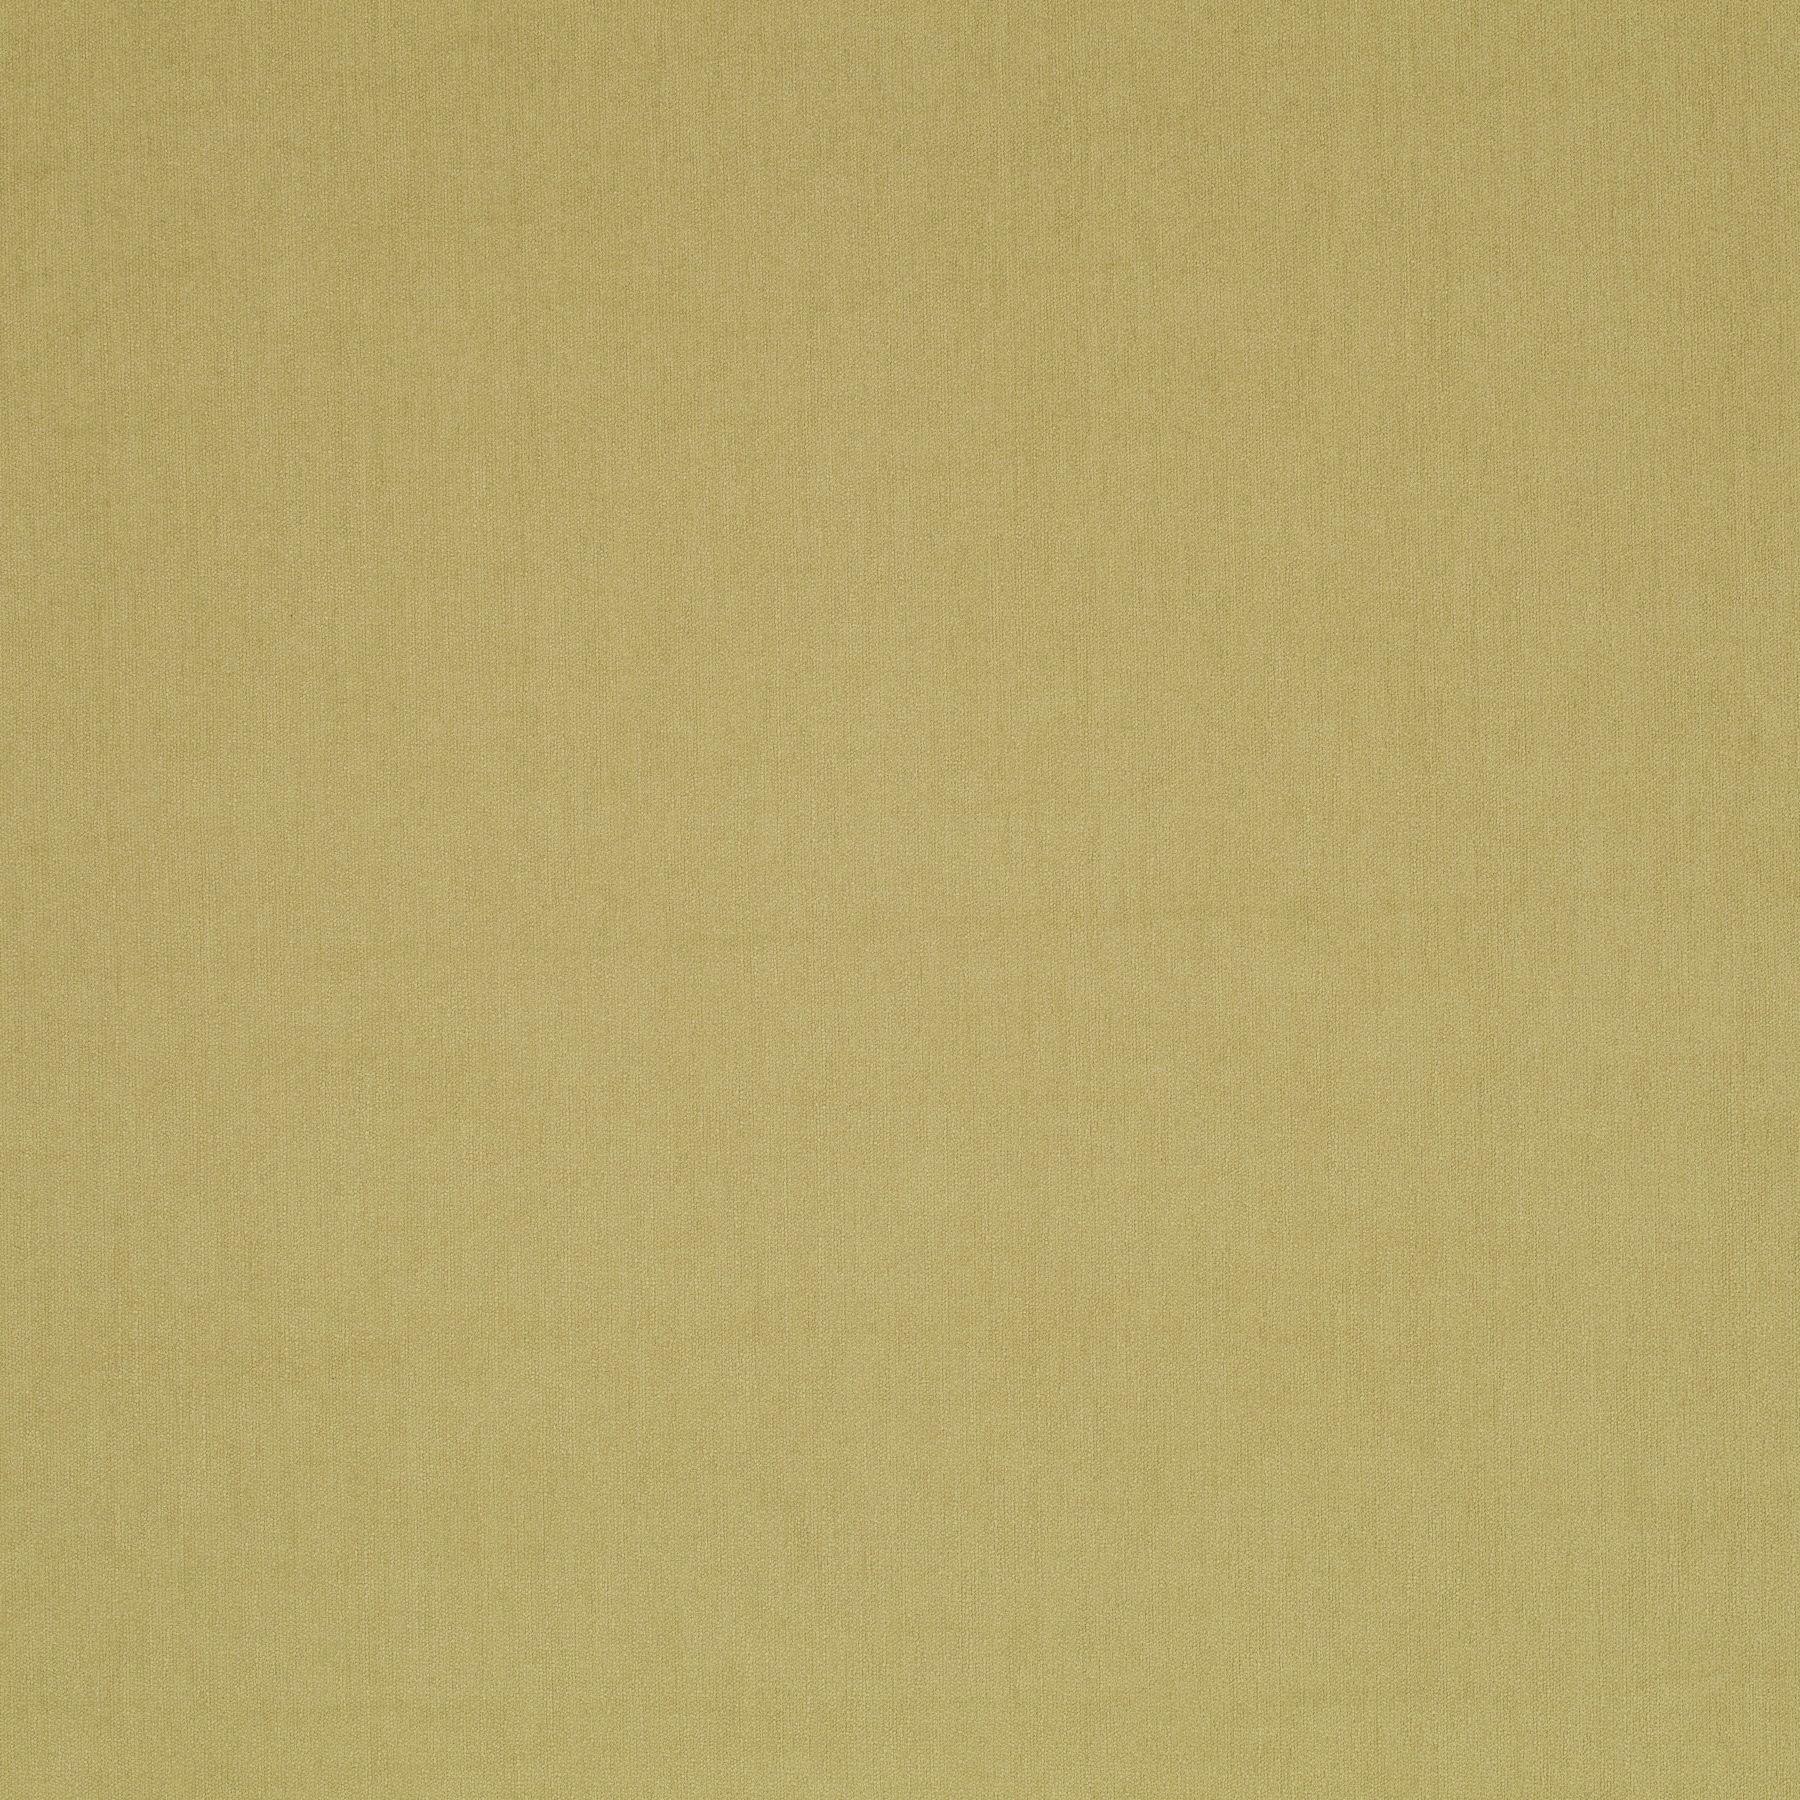 Decoration Fabric Thermi 8 3131 030 Gardisette